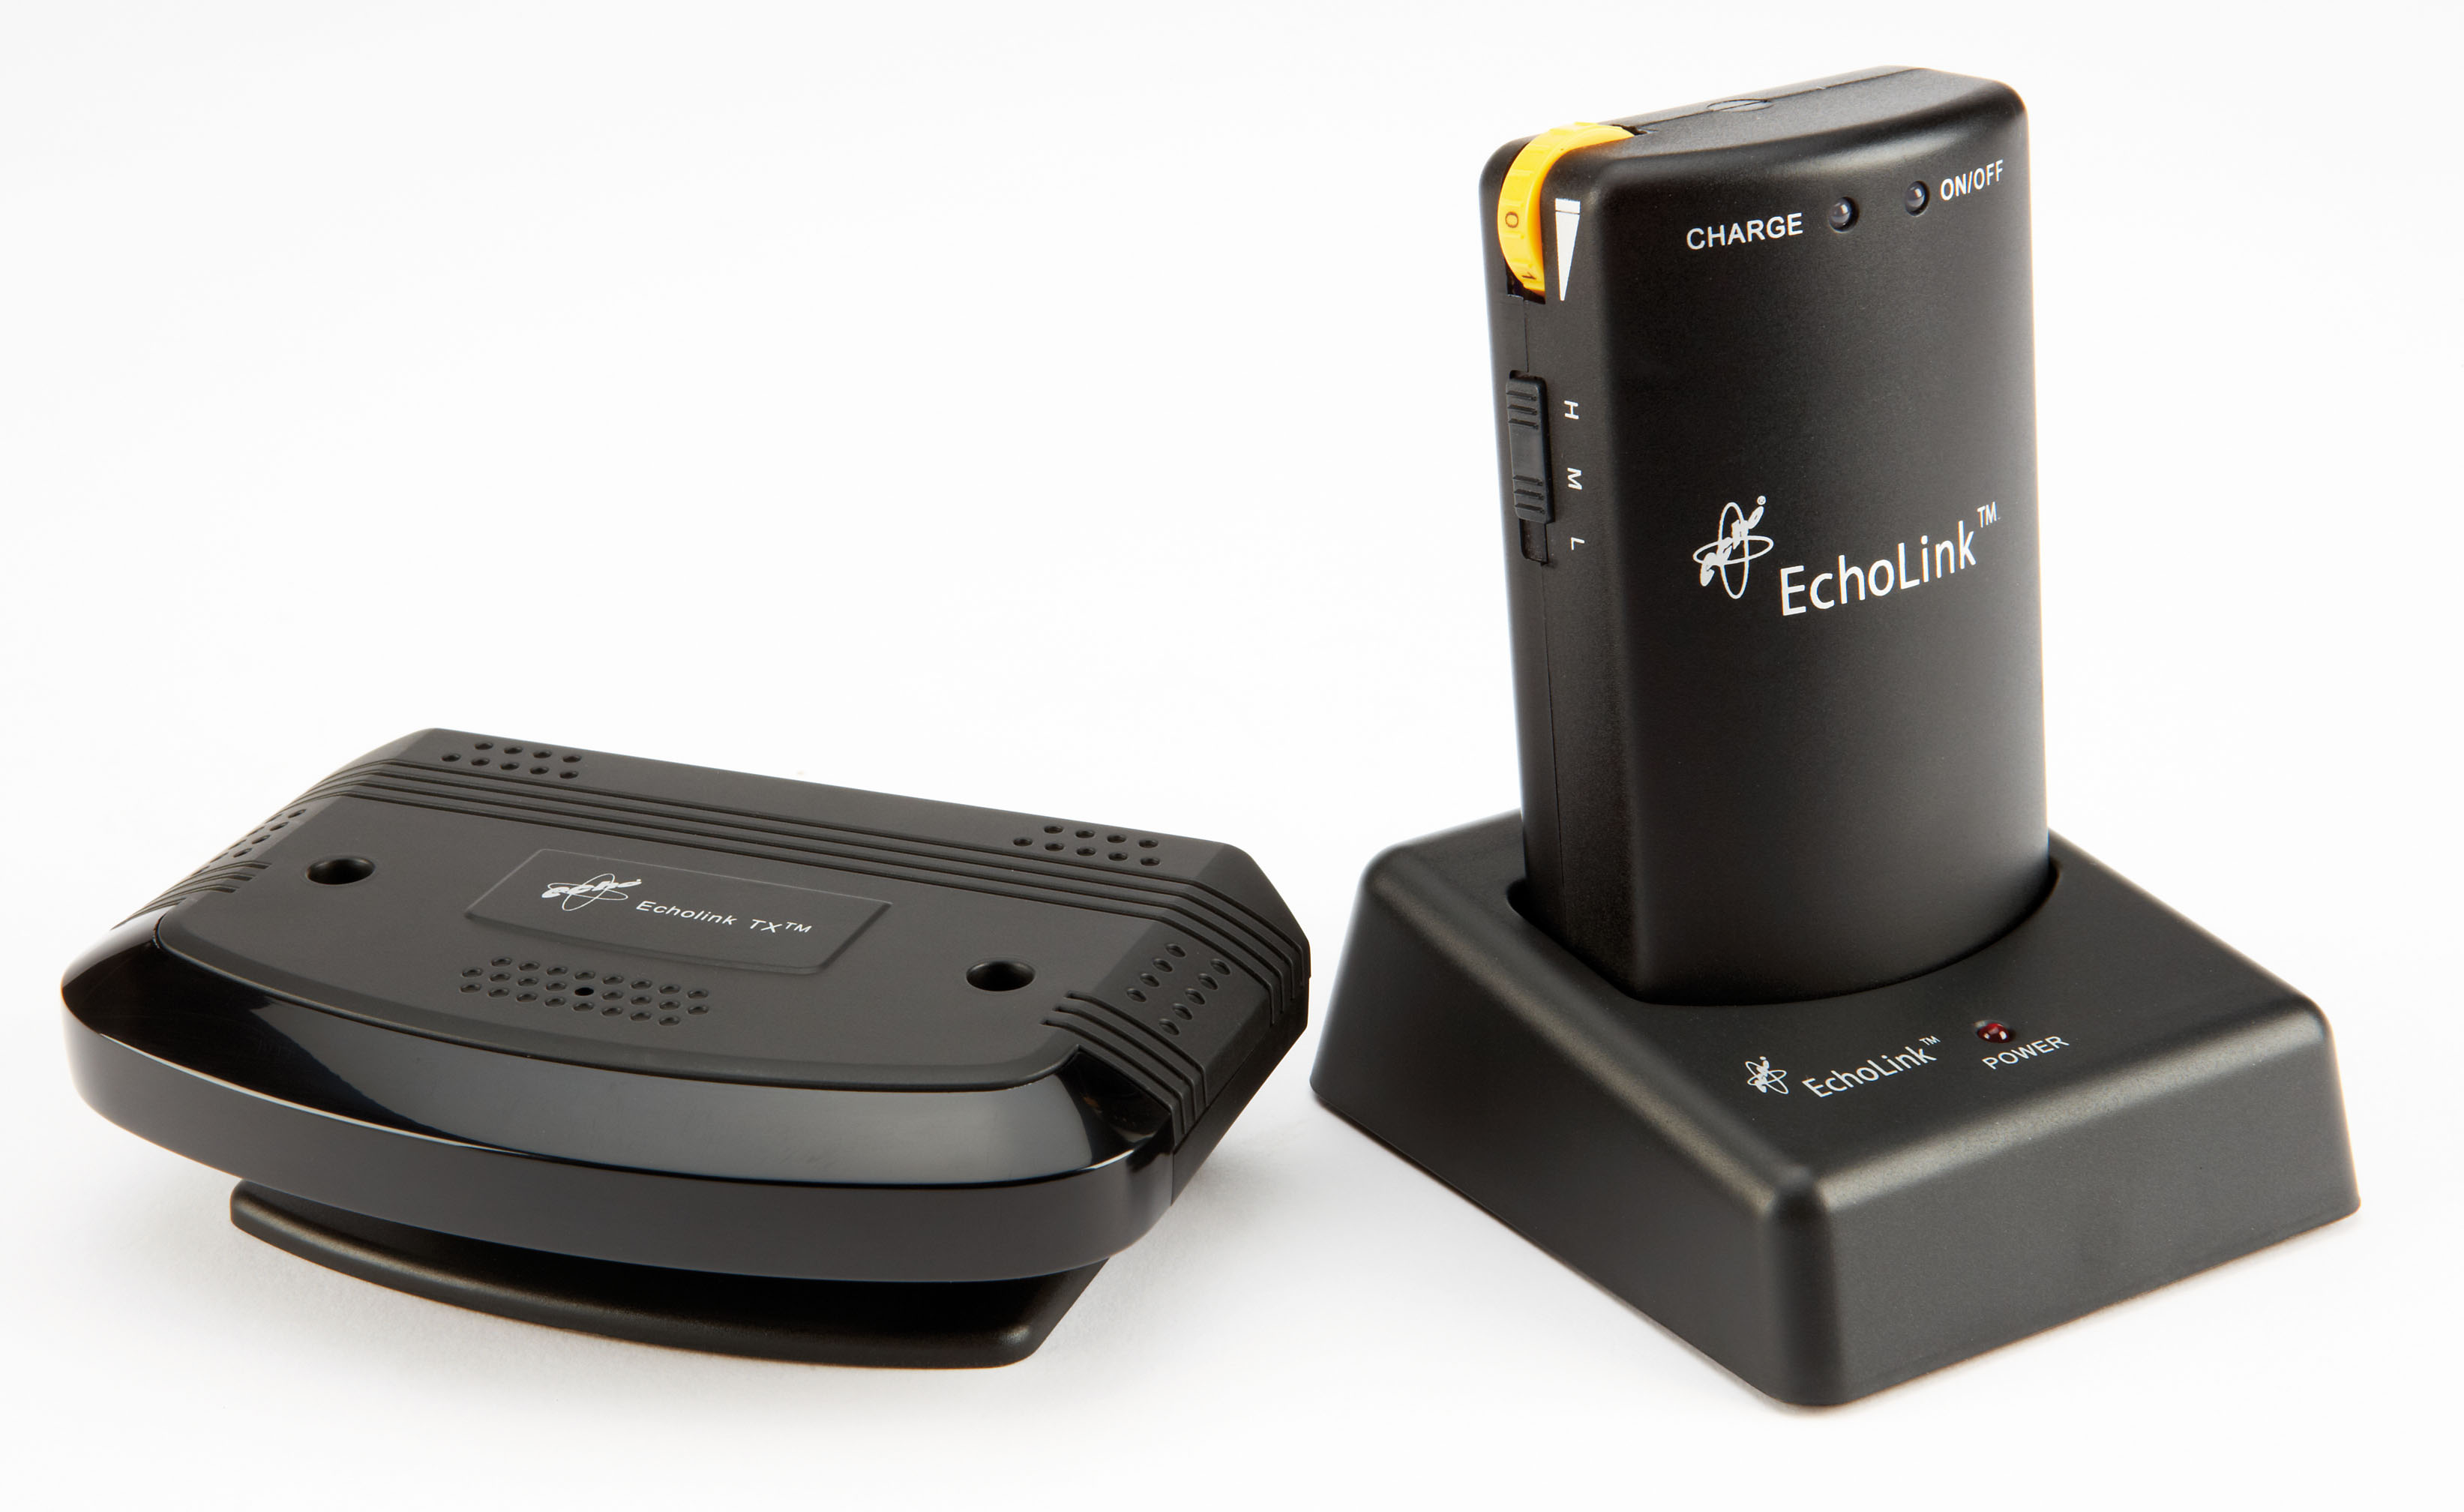 Echolink Infrared Wireless Listener - Living made easy